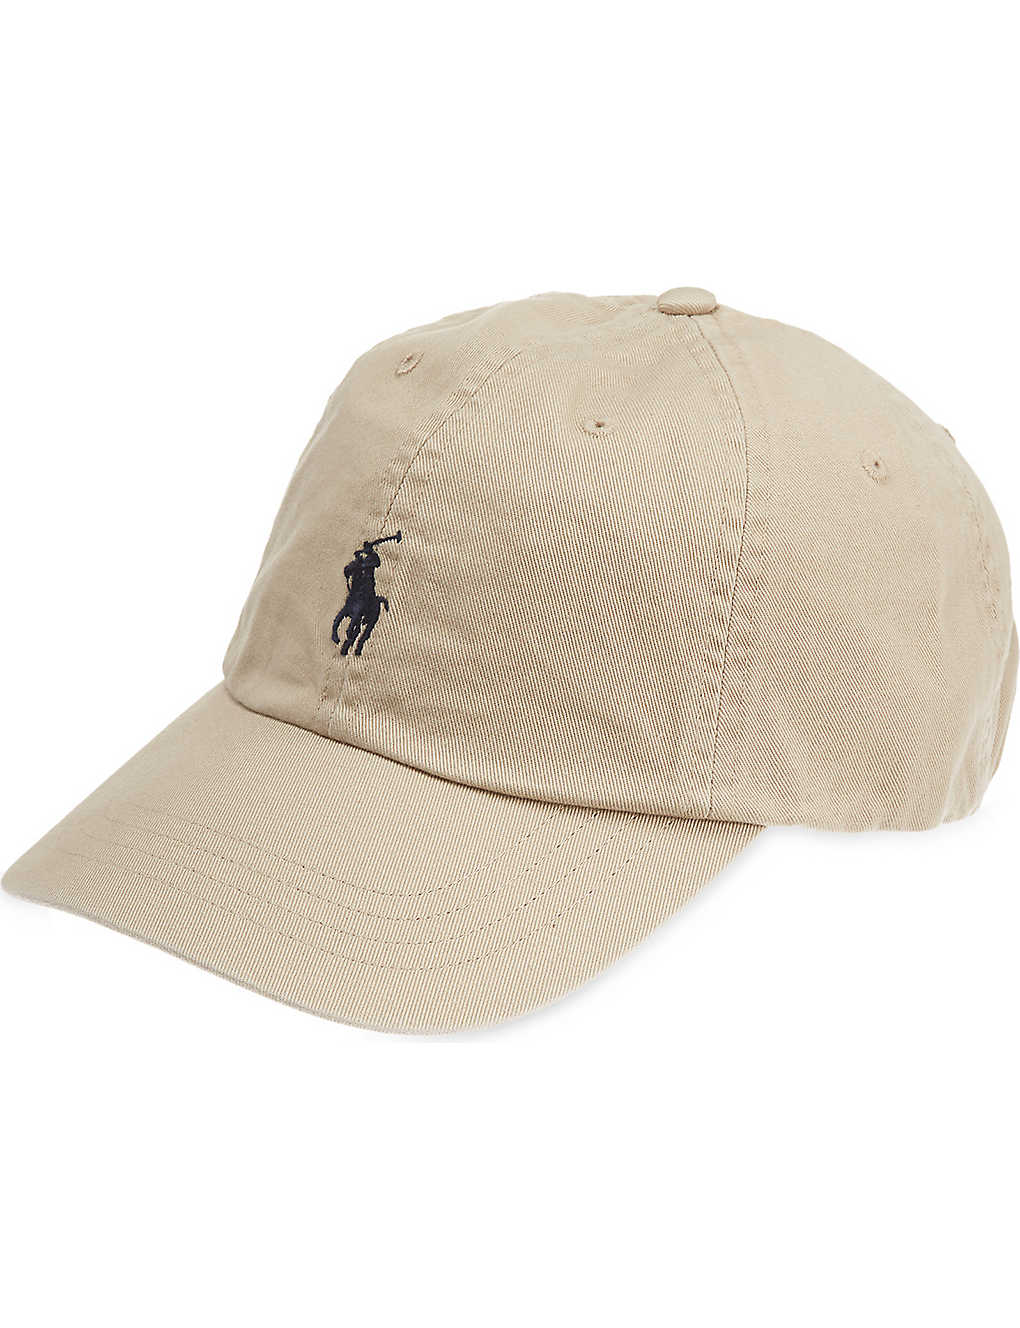 04979c55 POLO RALPH LAUREN - Classic Pony baseball cap | Selfridges.com